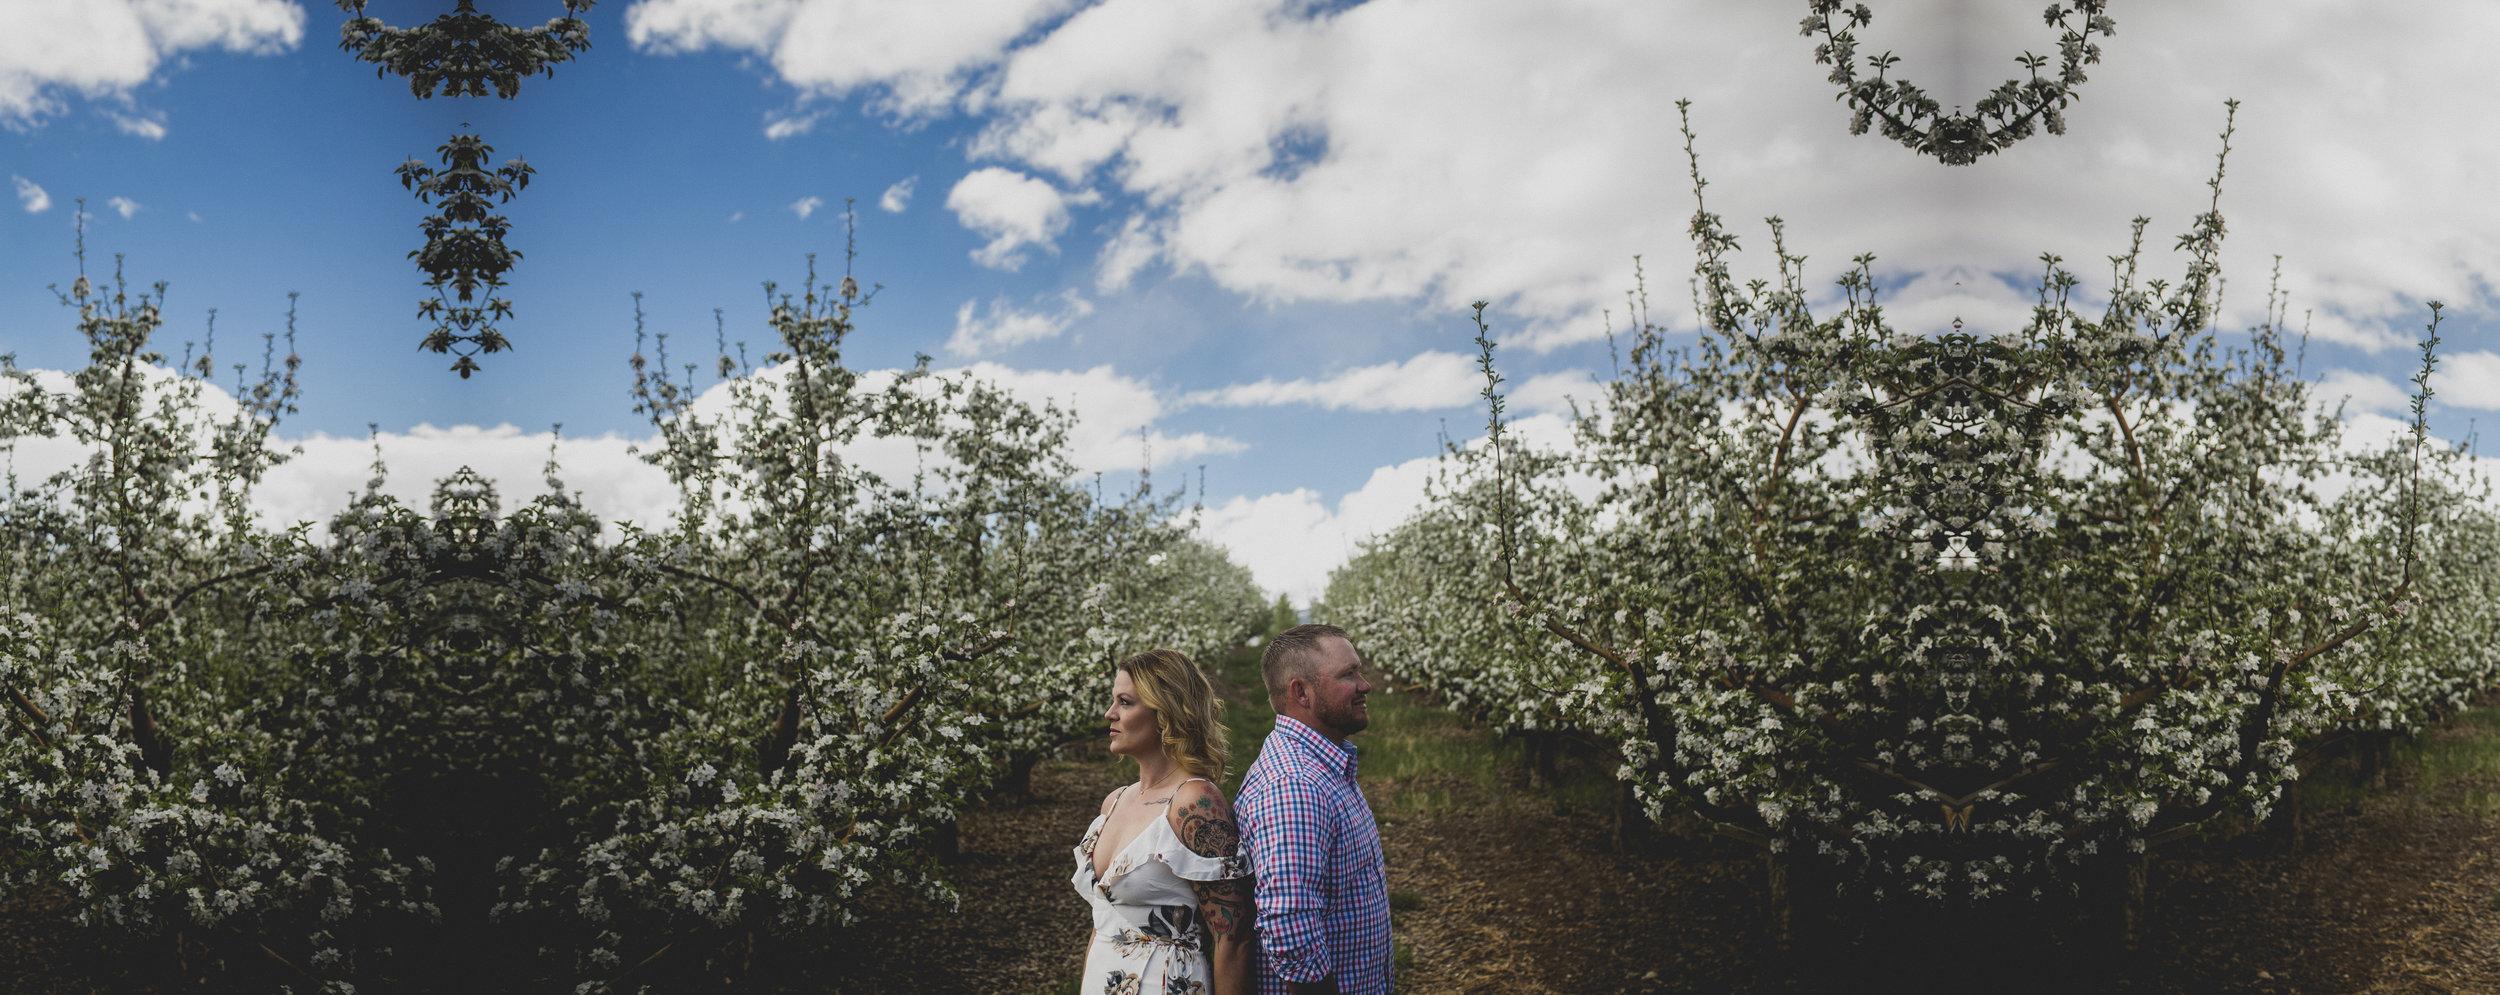 Telluride-wedding-photography-leahandashtonphotography-.jpg